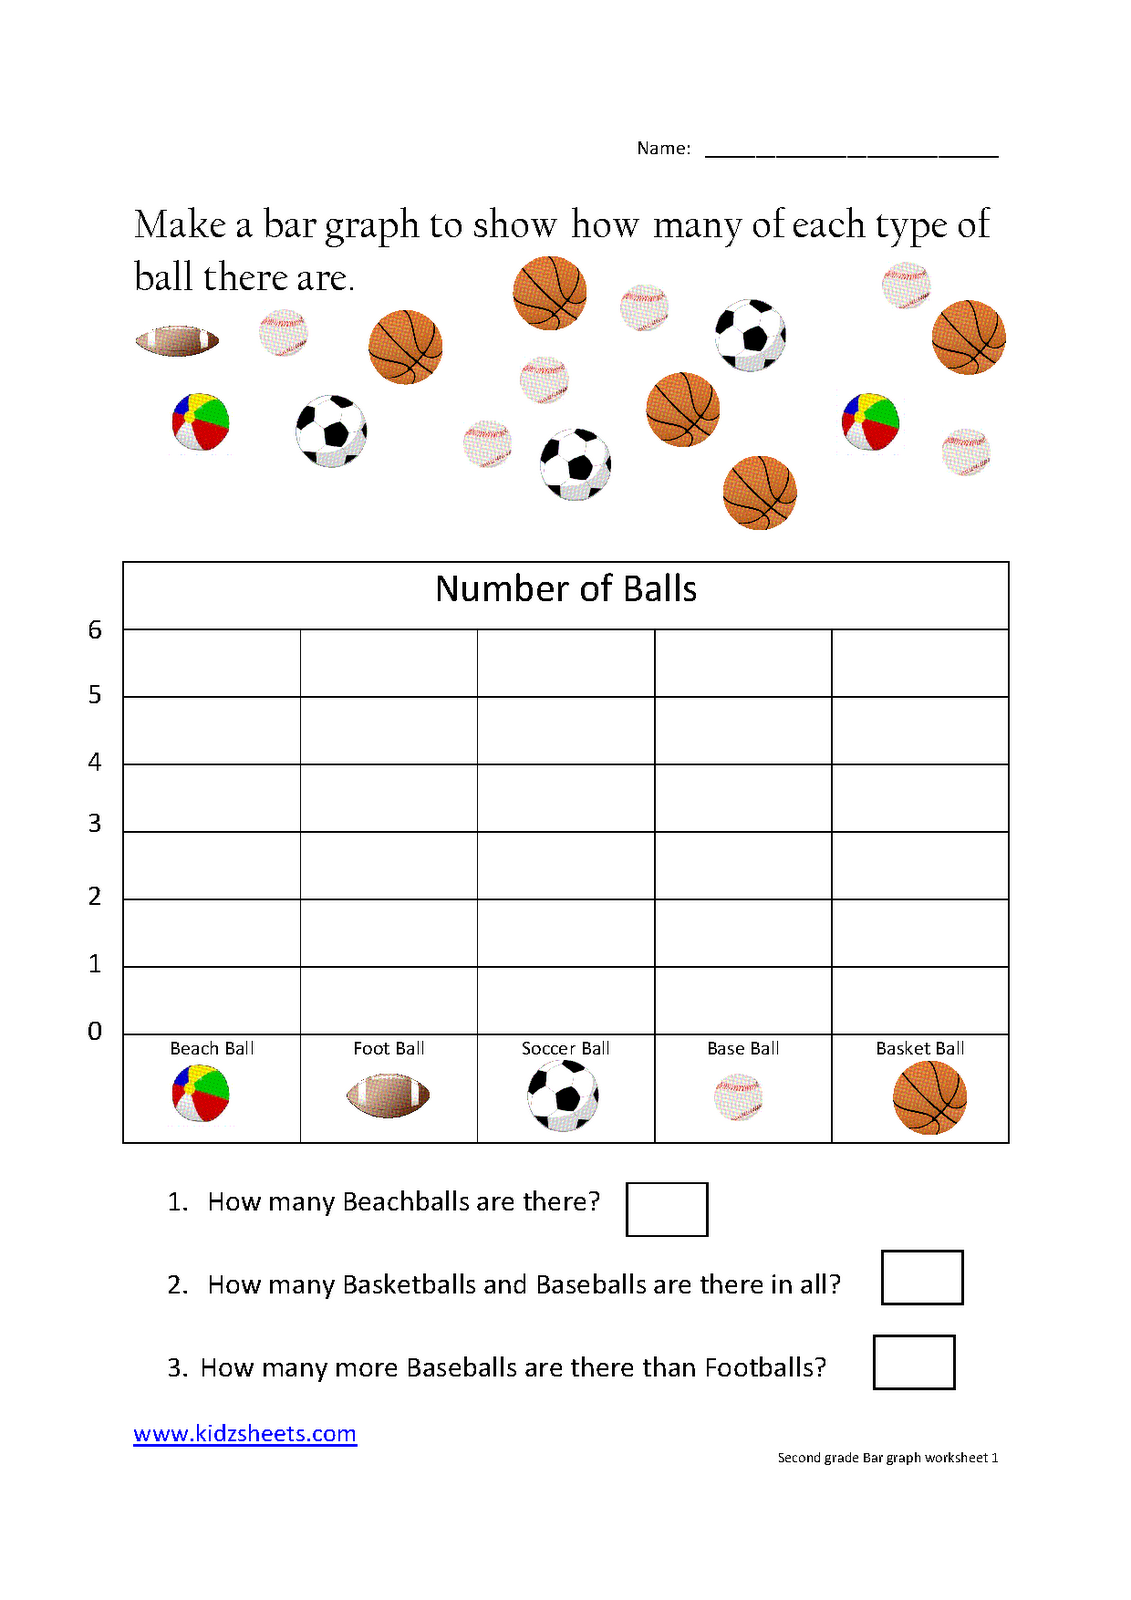 small resolution of Kidz Worksheets: Second Grade Bar Graph Worksheet1   Kids math worksheets